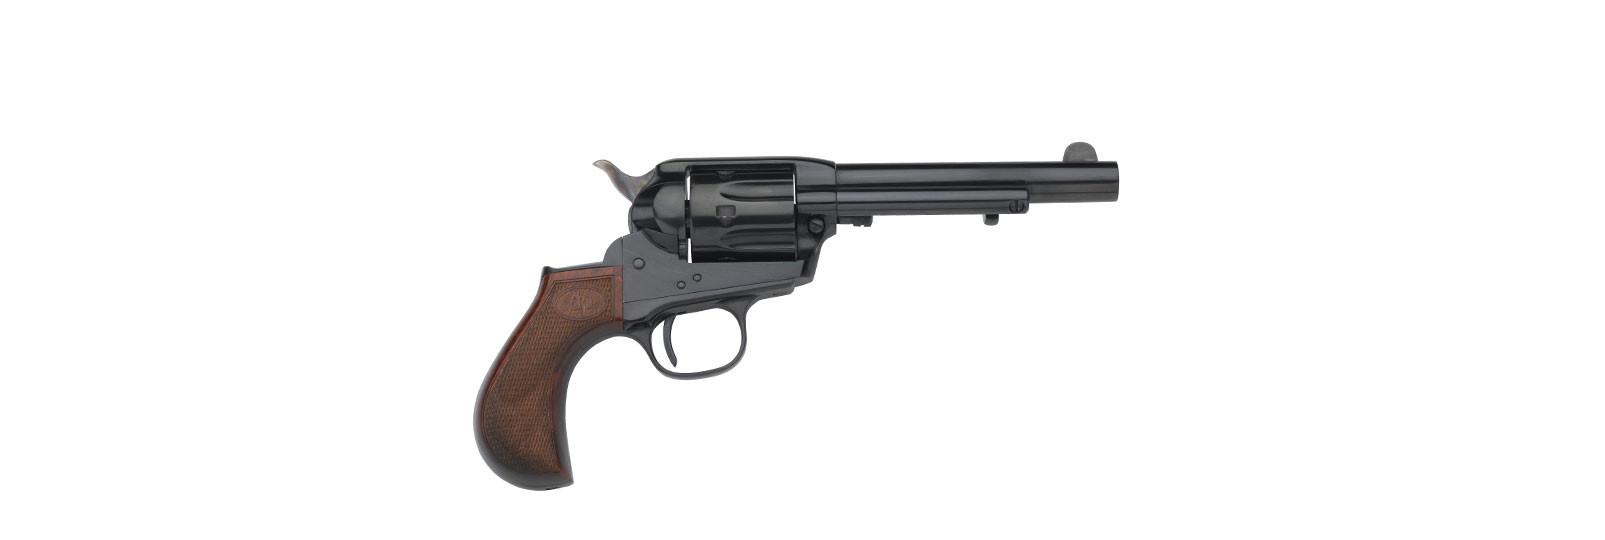 "Doc holliday revolver blued 5"" .38 sp."